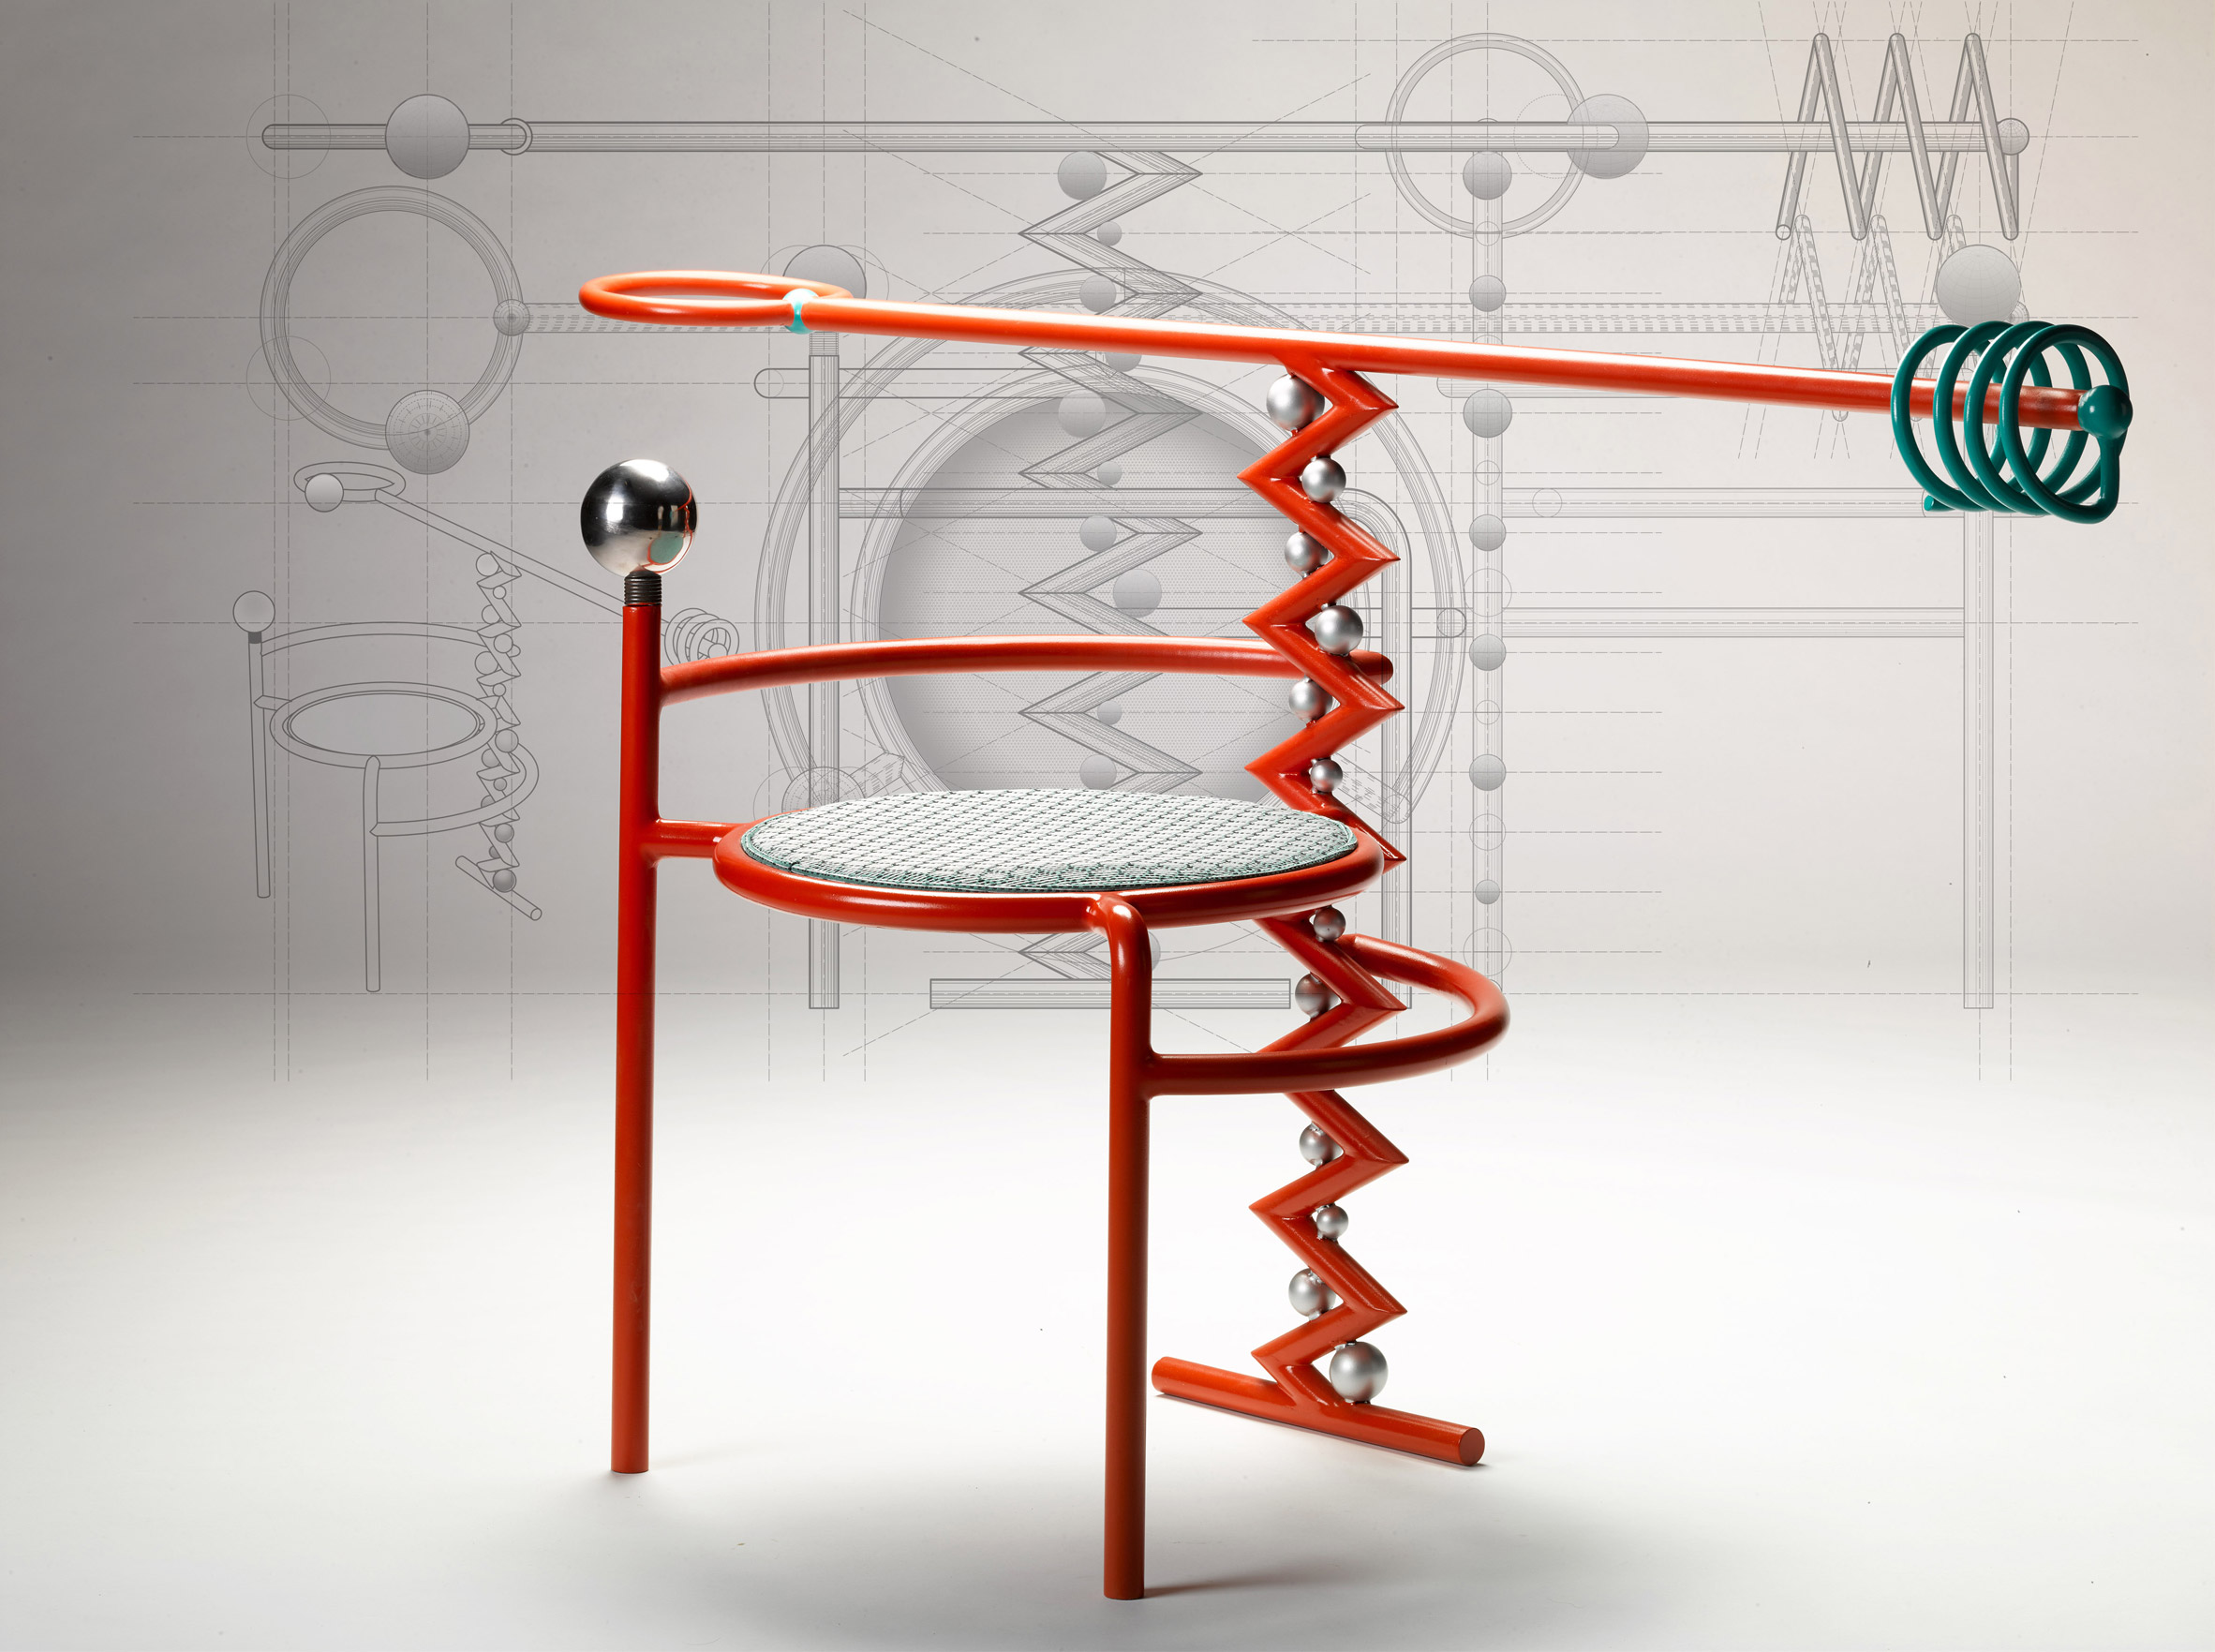 hu-yuming-chairs-behaviour-graduate-china-design_dezeen_2364_col_1